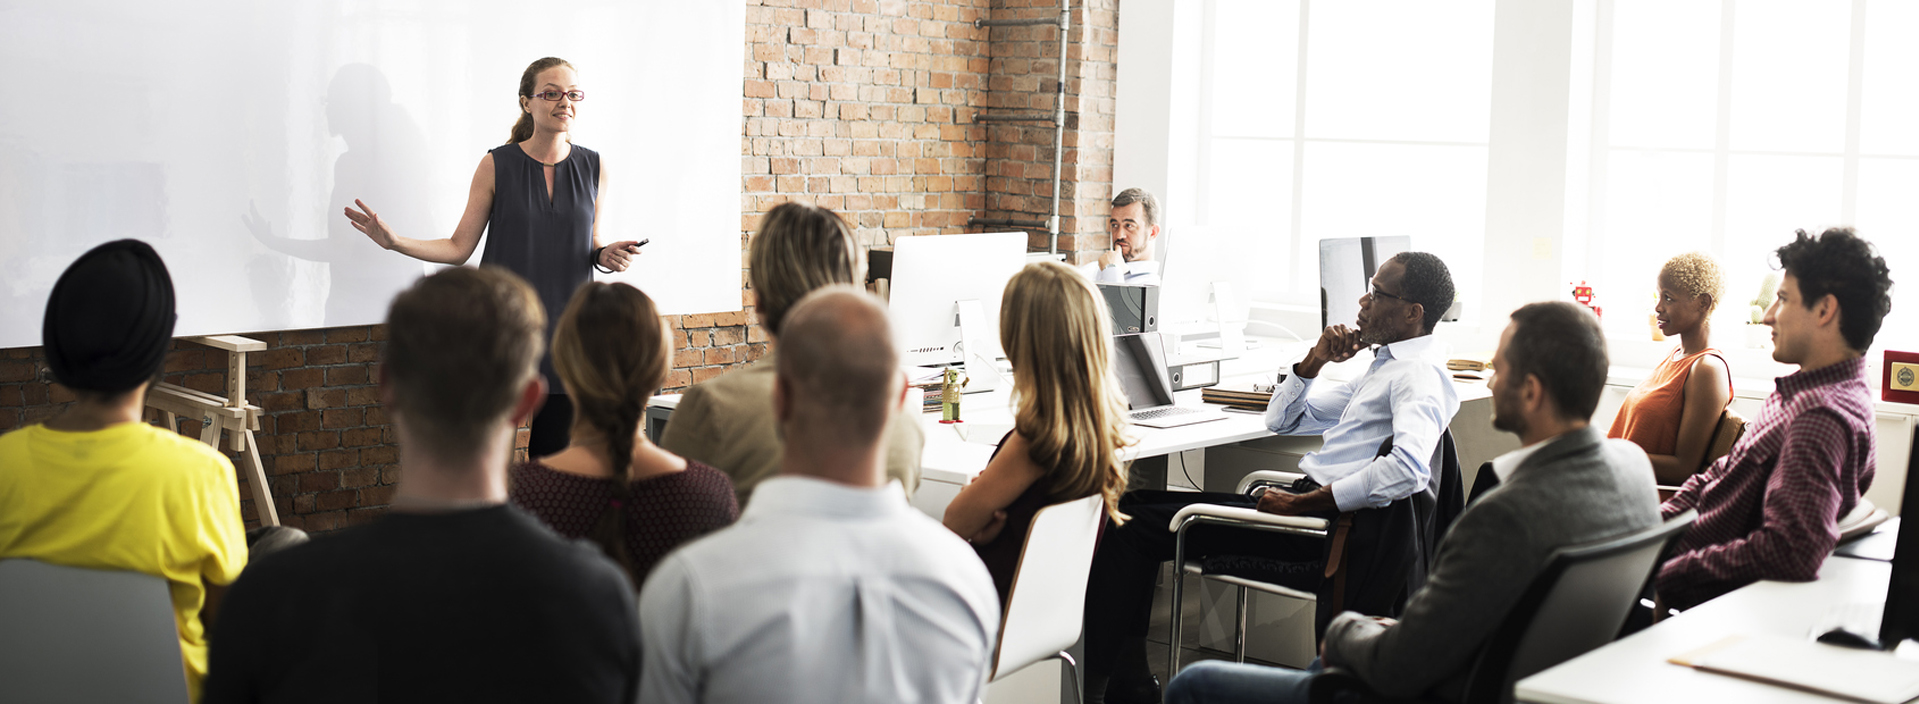 Professionals in a classroom